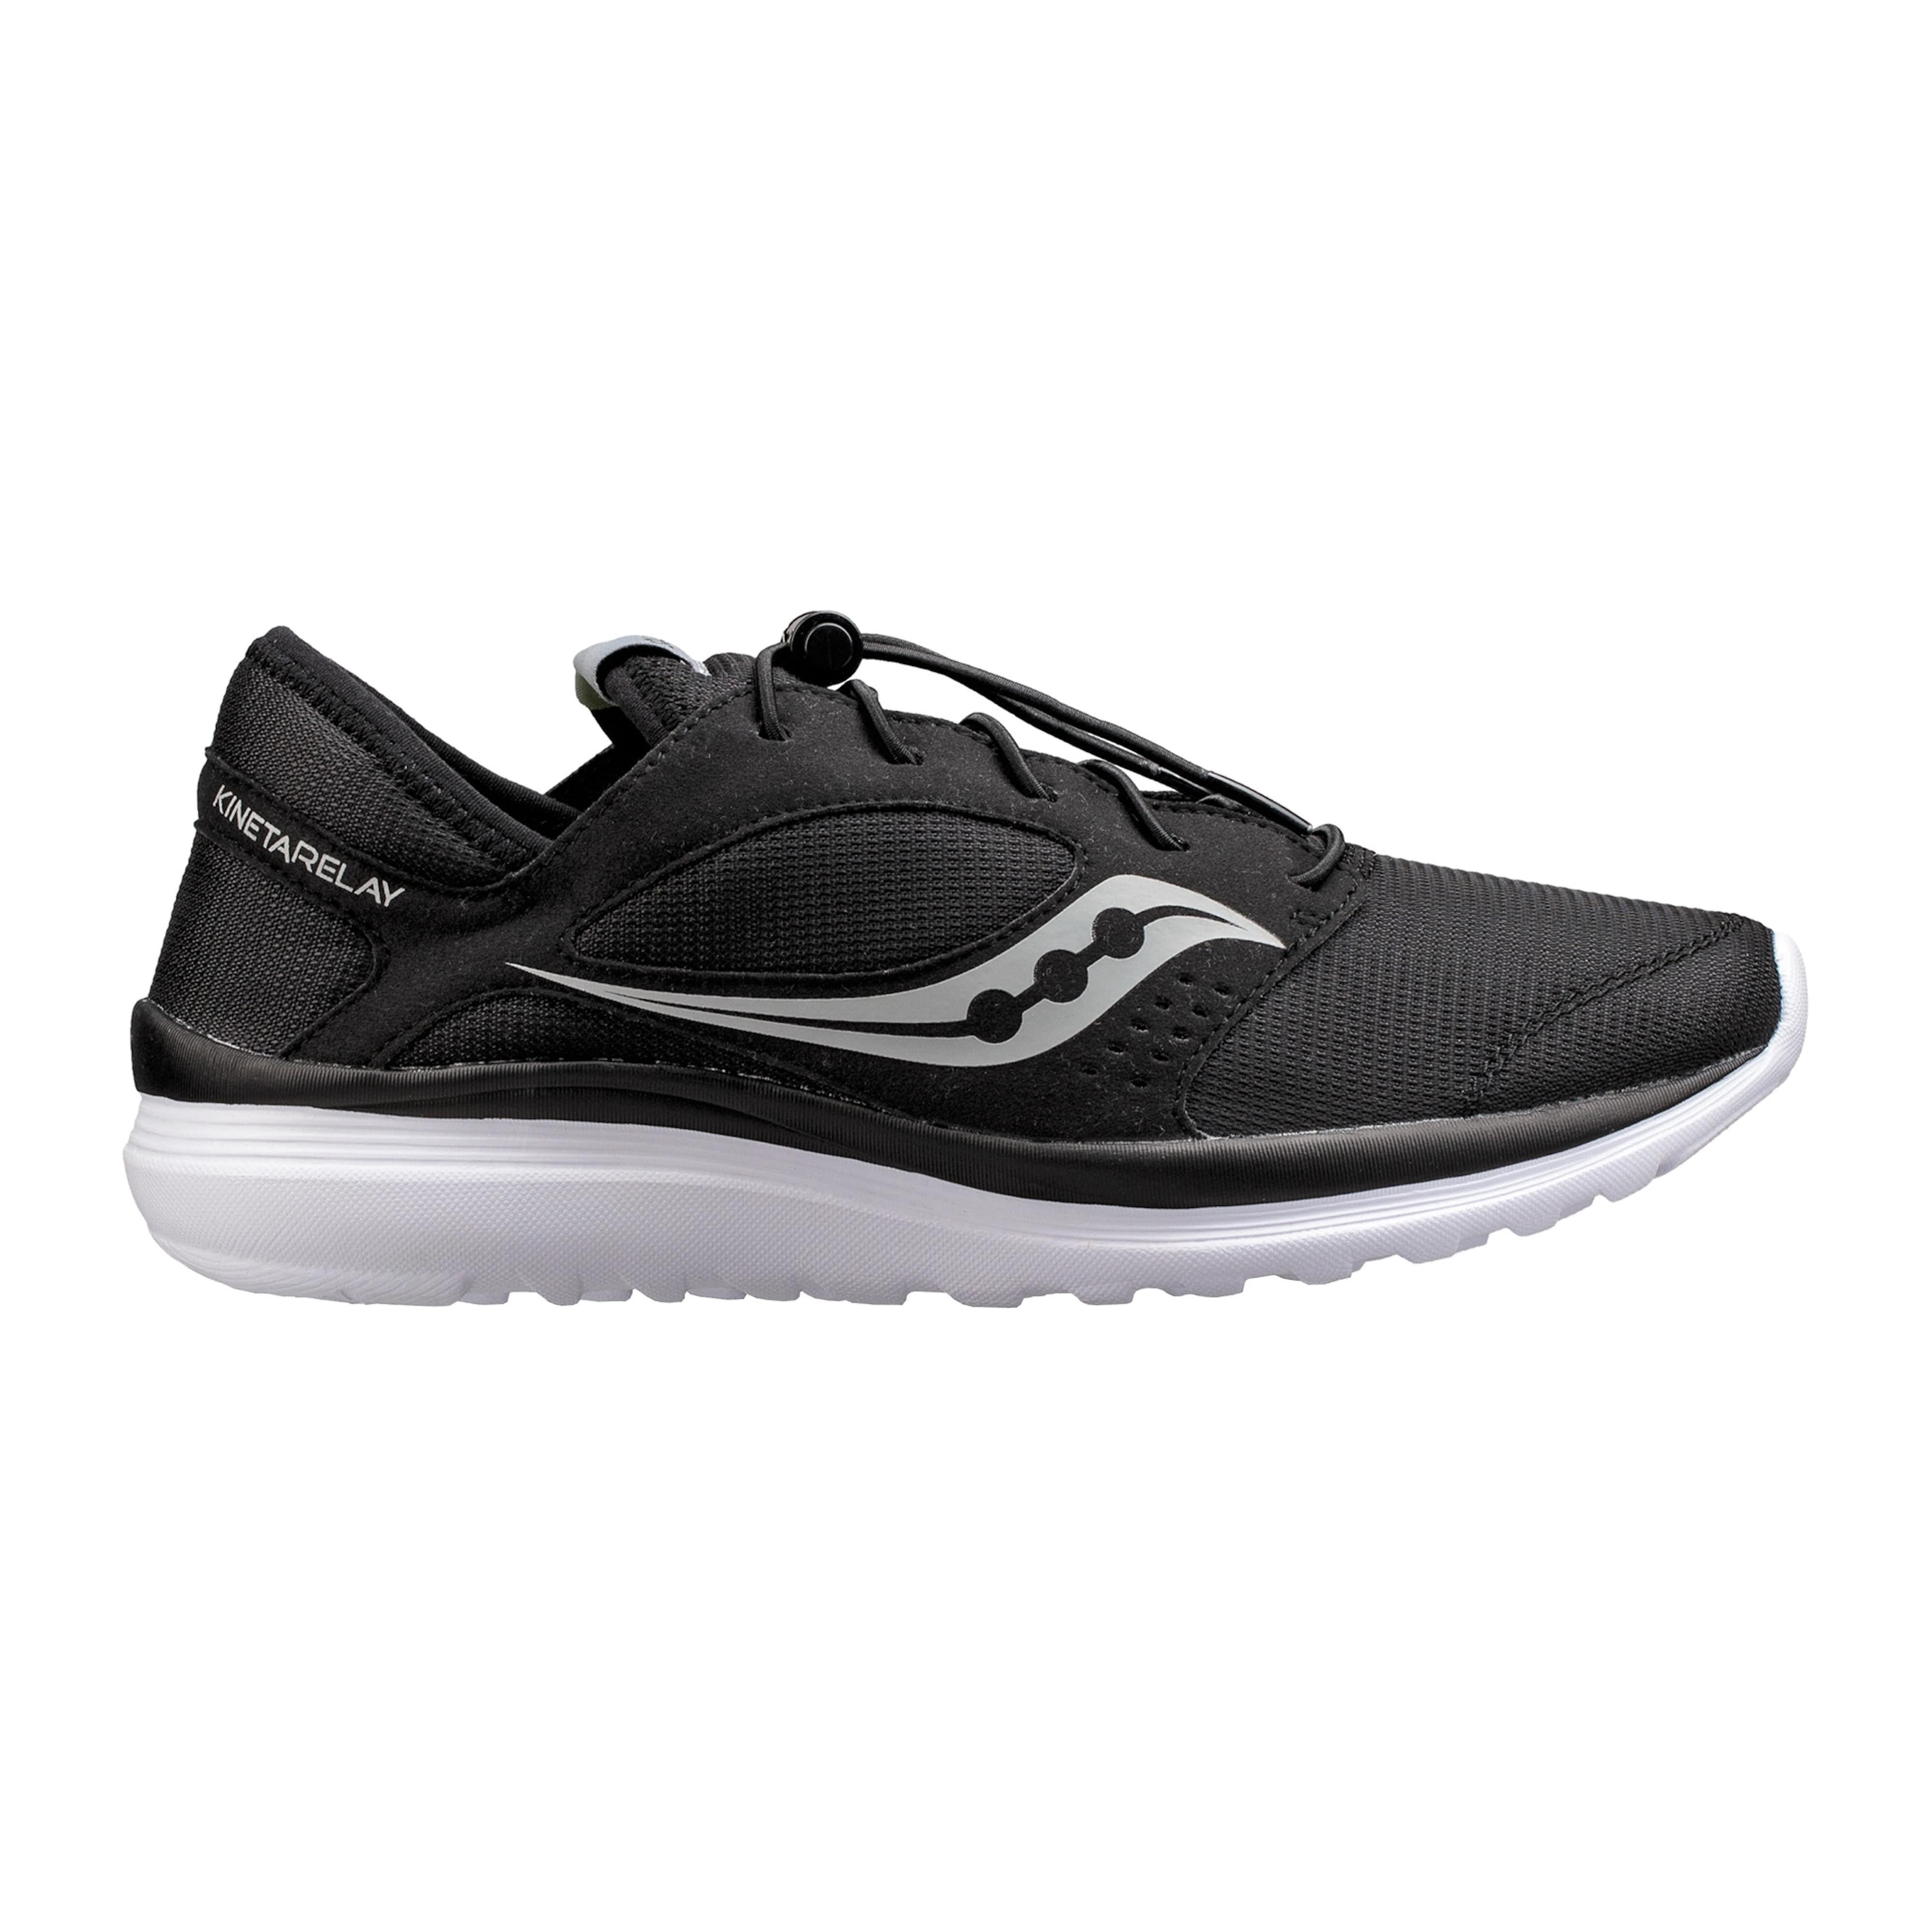 85024e29b60d Saucony Kineta Relay Men s Active Lifestyle Shoes - Heather Black